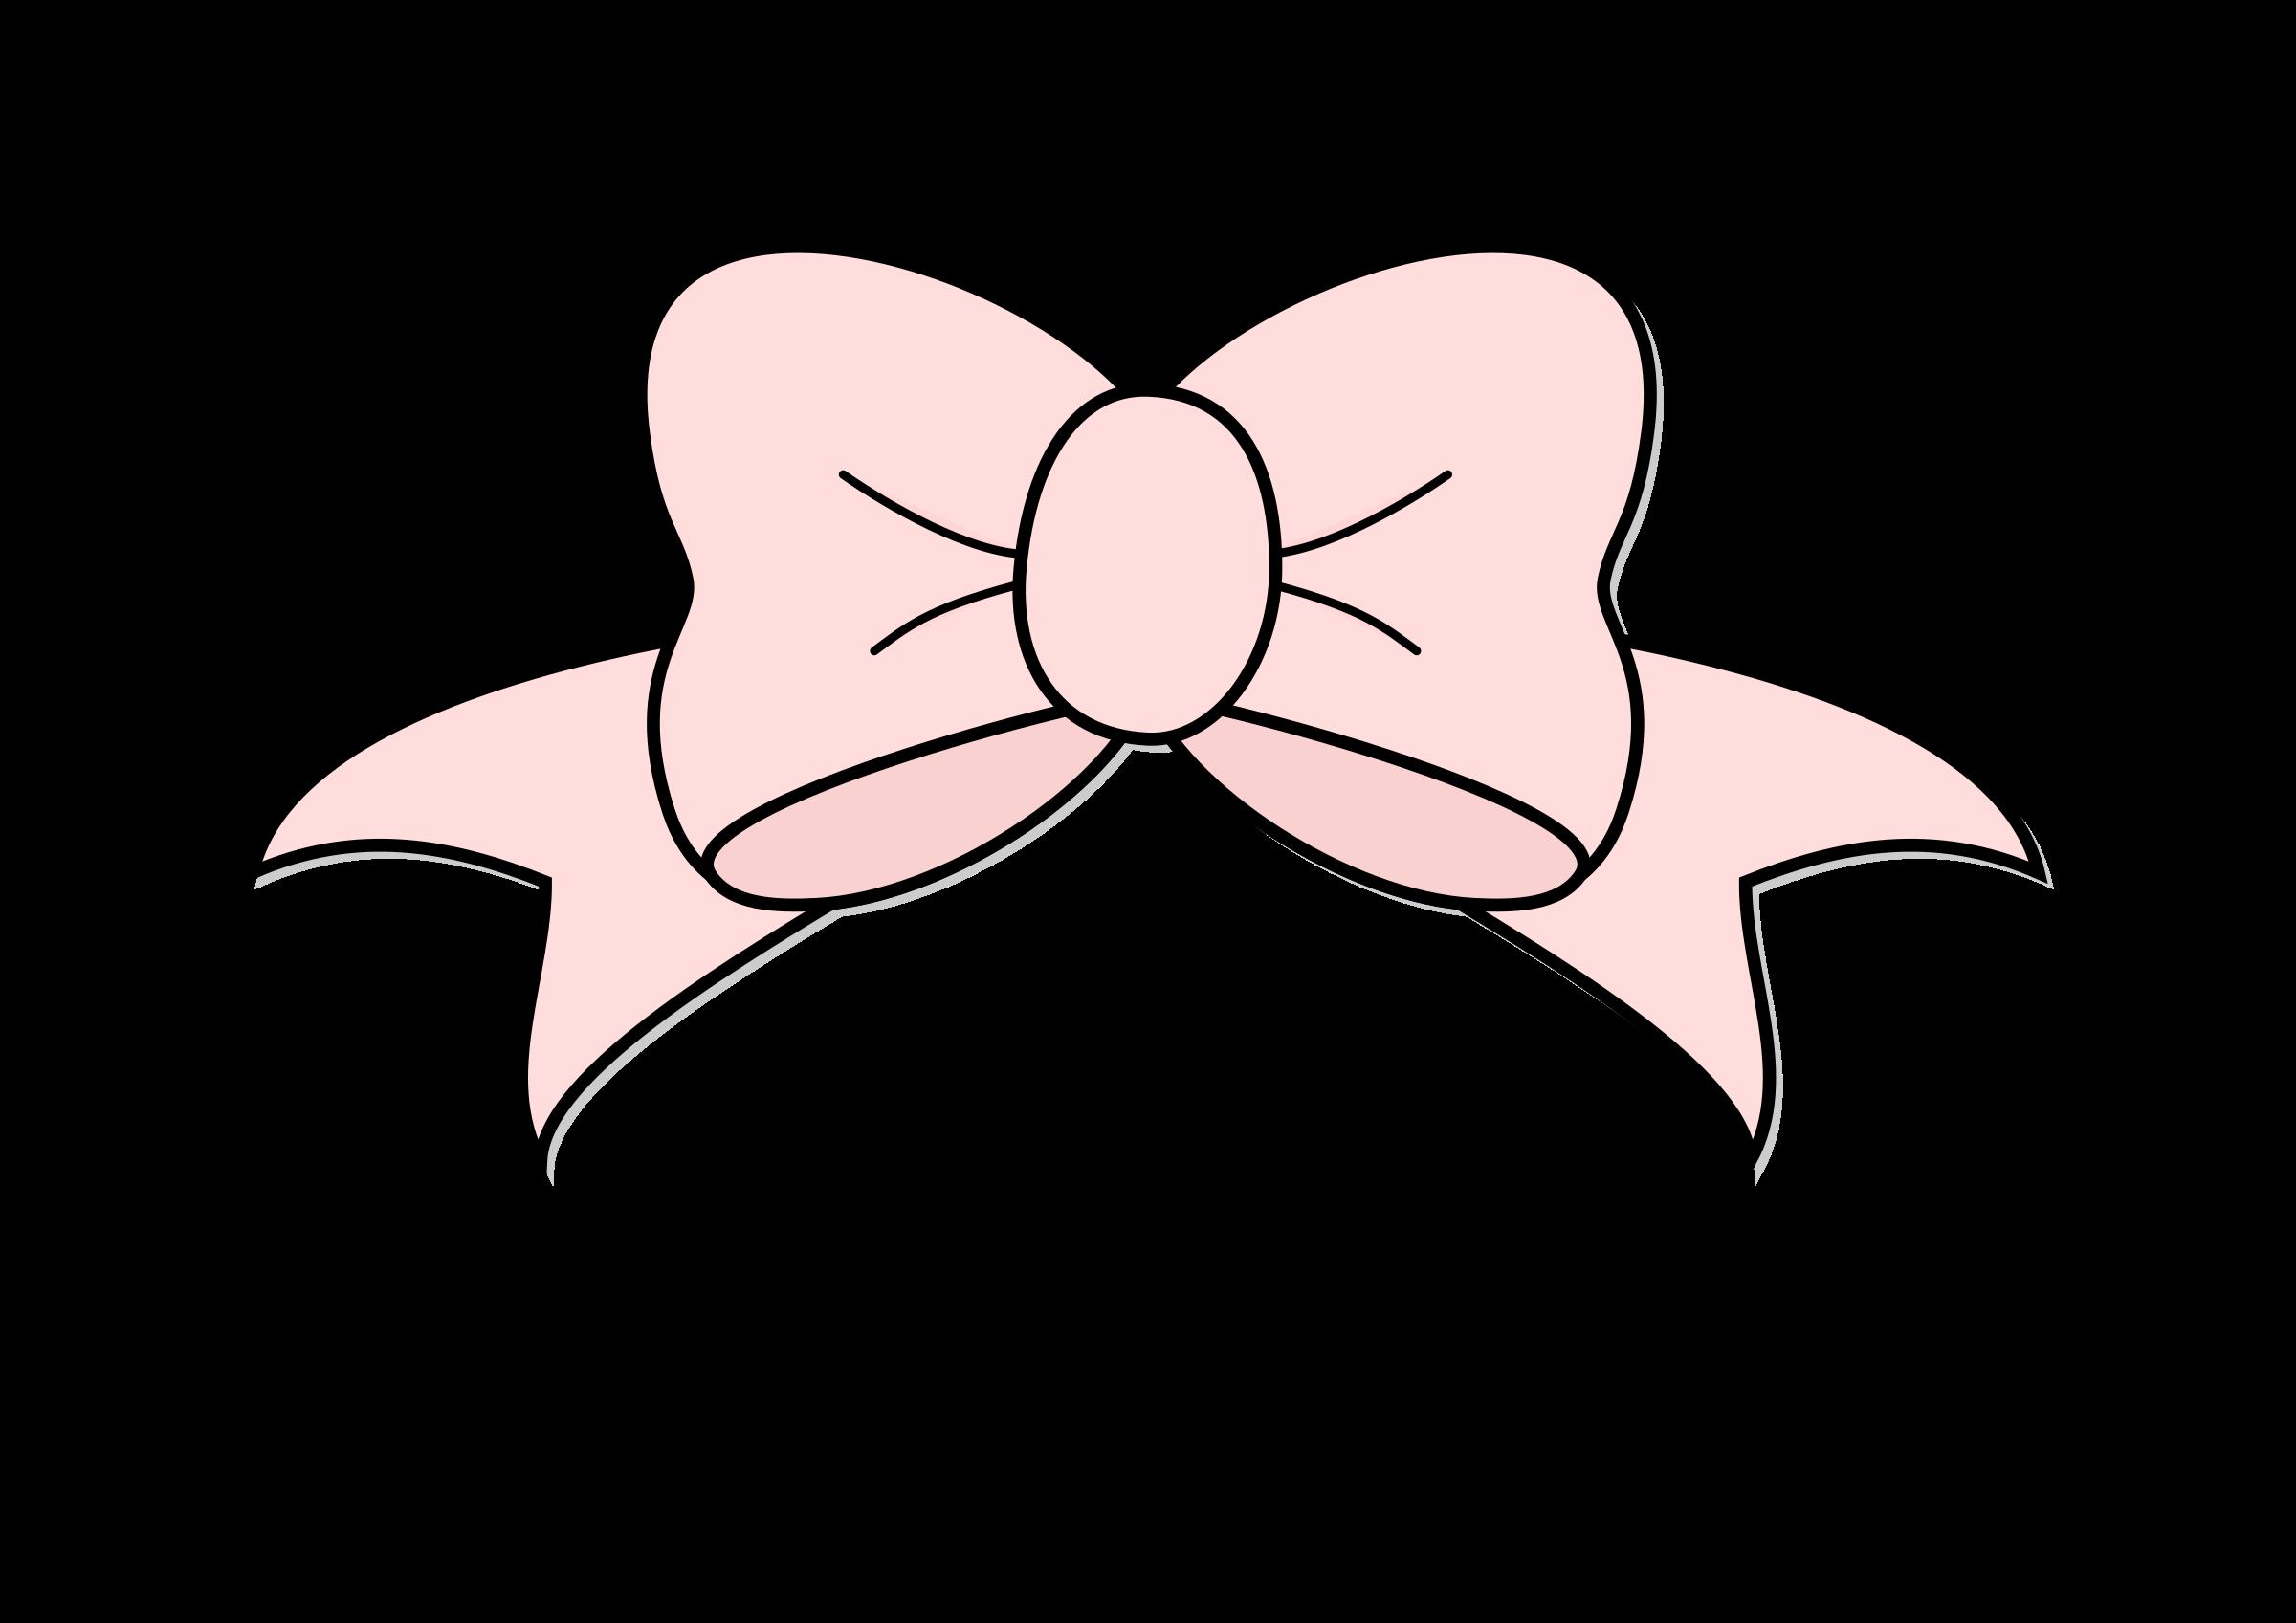 Bowtie Clipart Hair Bow Bowtie Hair Bow Transparent Free For